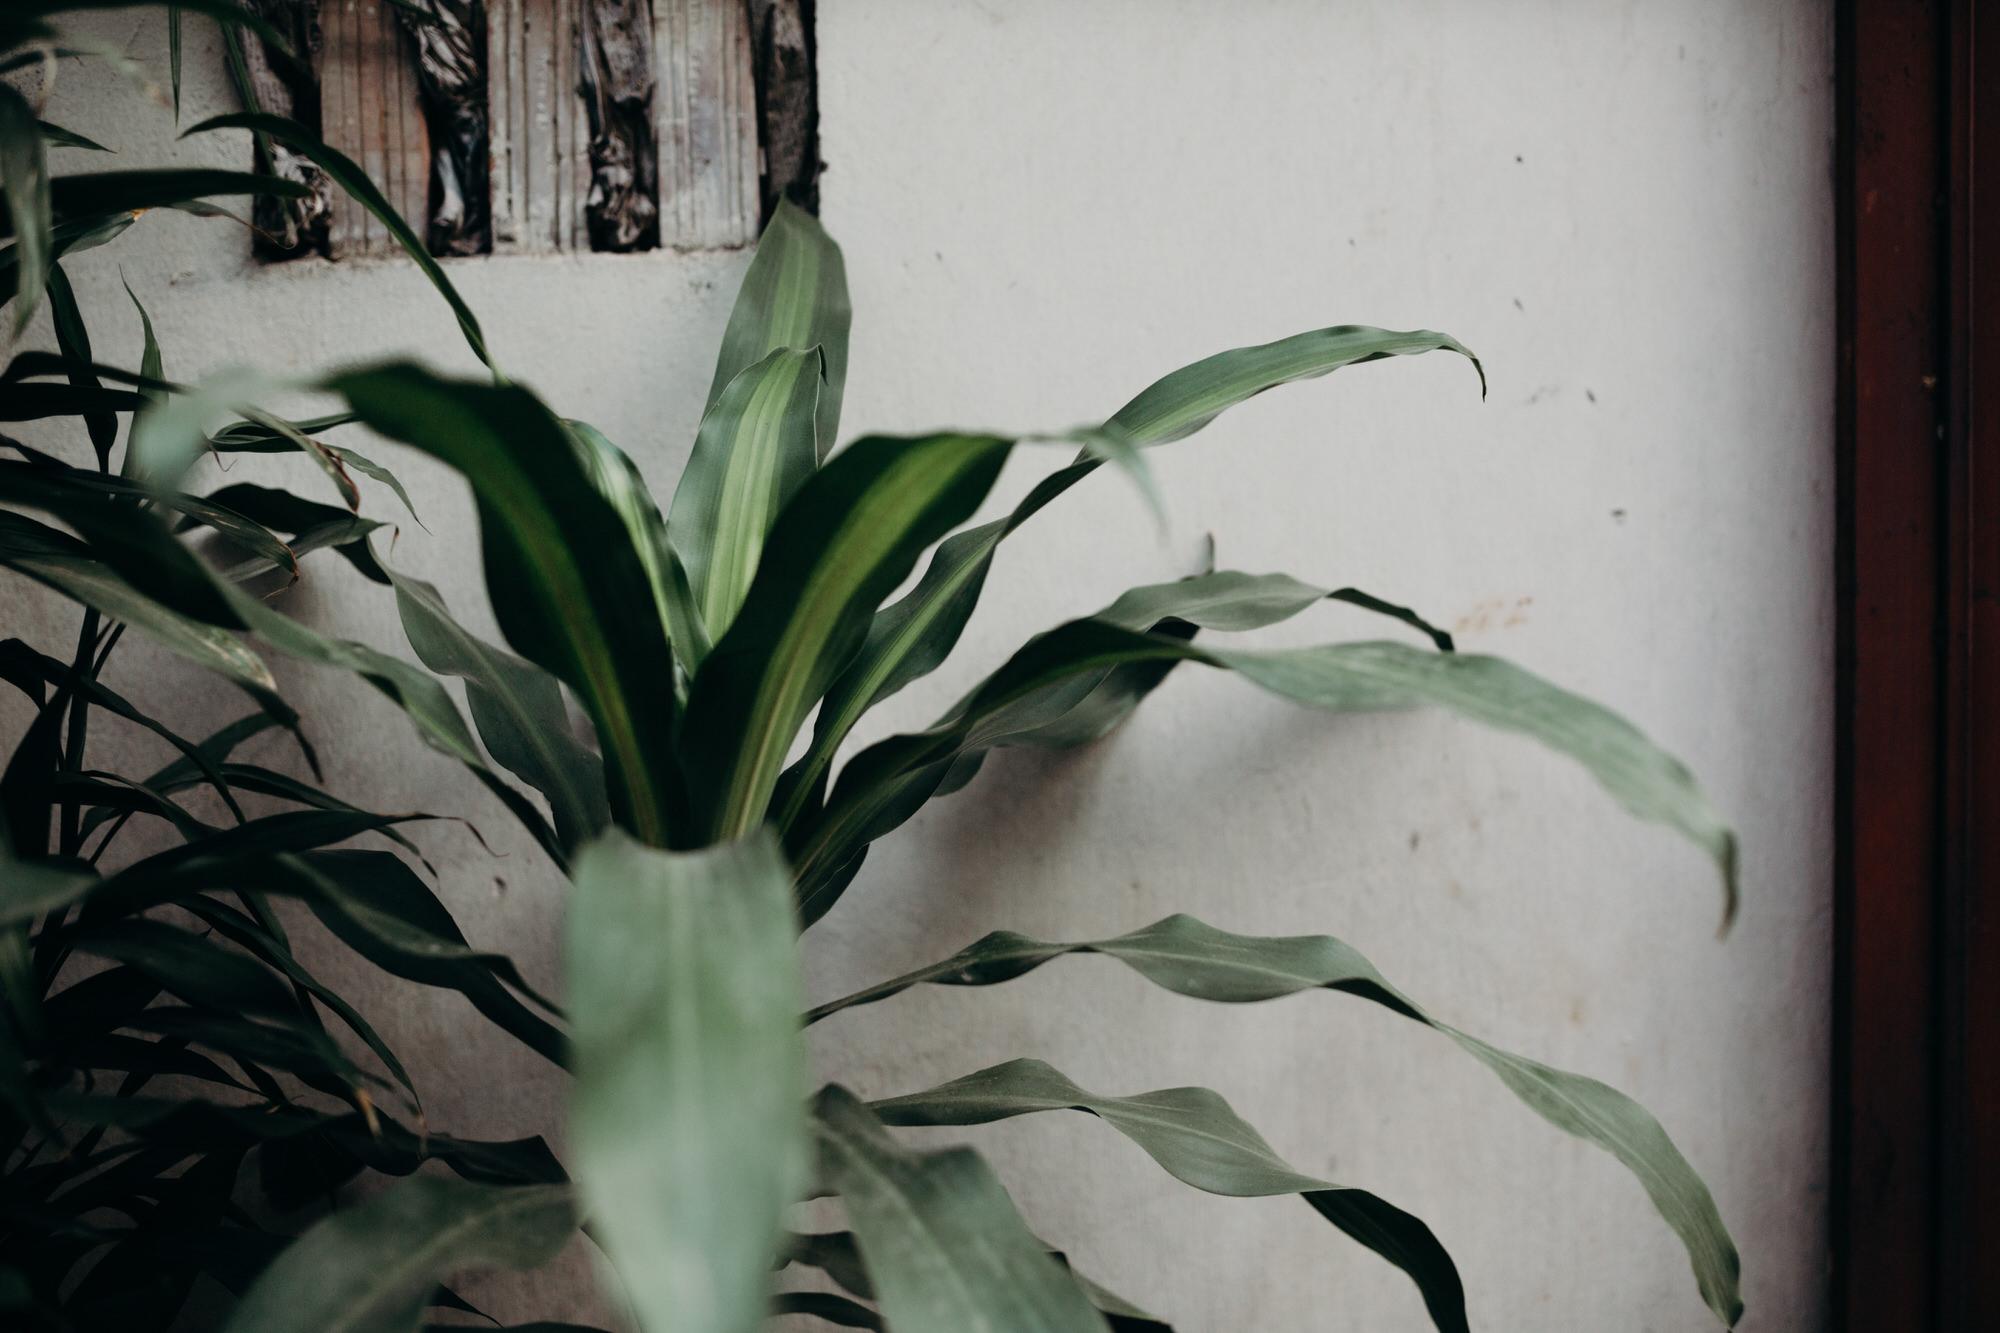 hanoivietnamcitytravelblog-9785-1.jpg